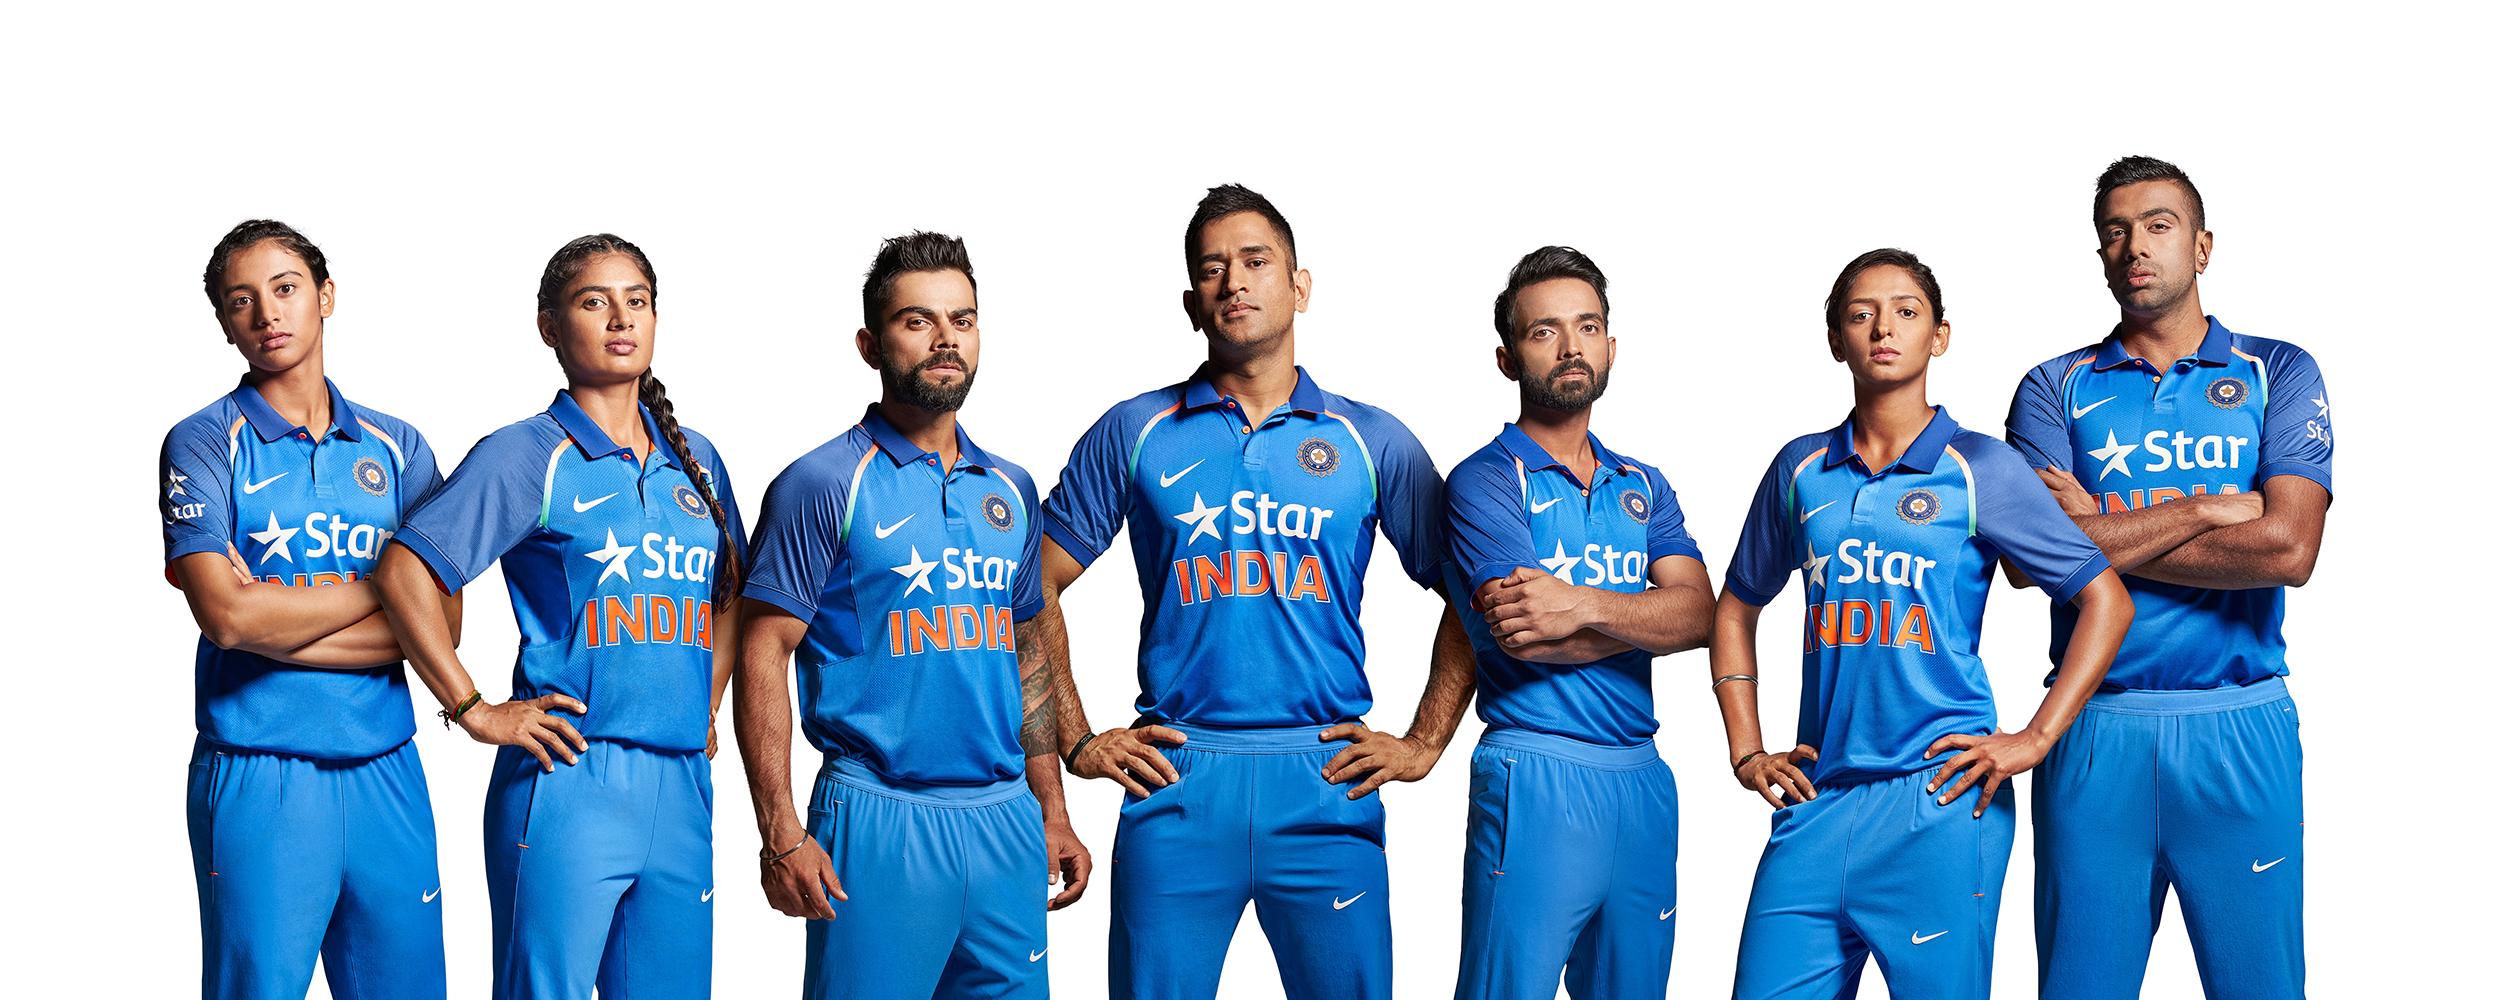 sp17_cricket_ntk_final_image_65267